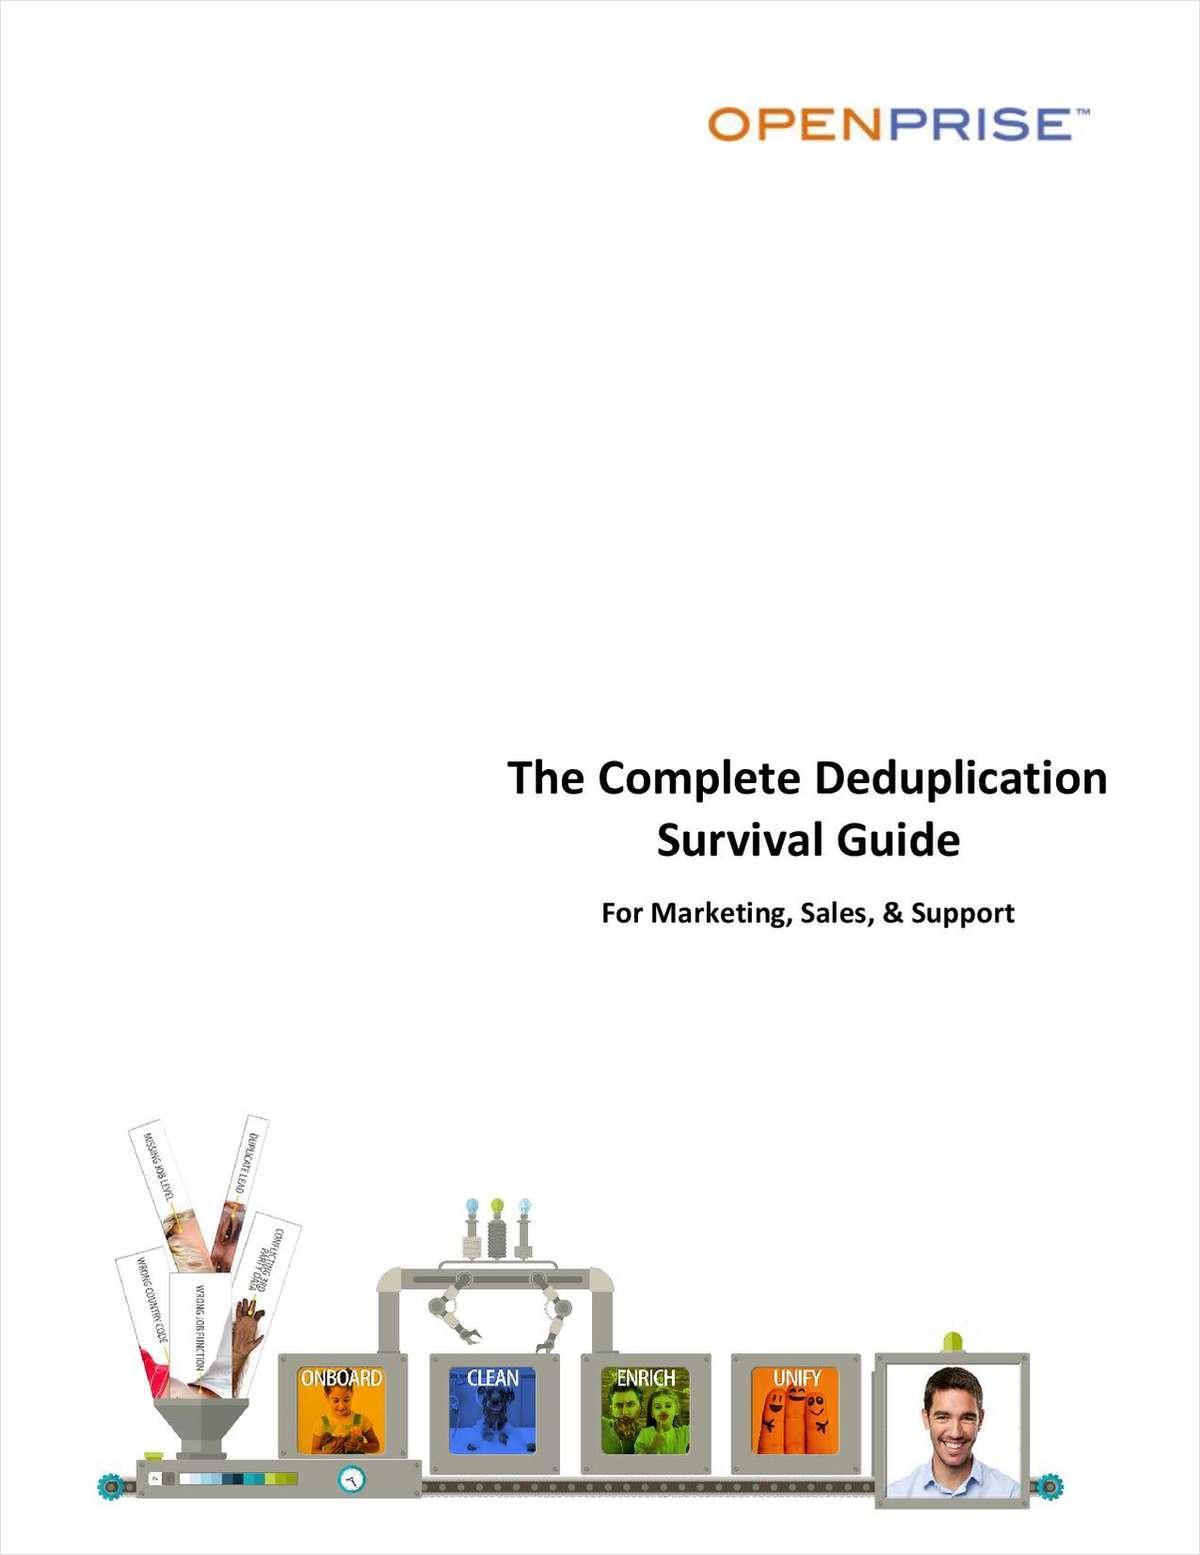 The Complete Deduplication Survival Guide